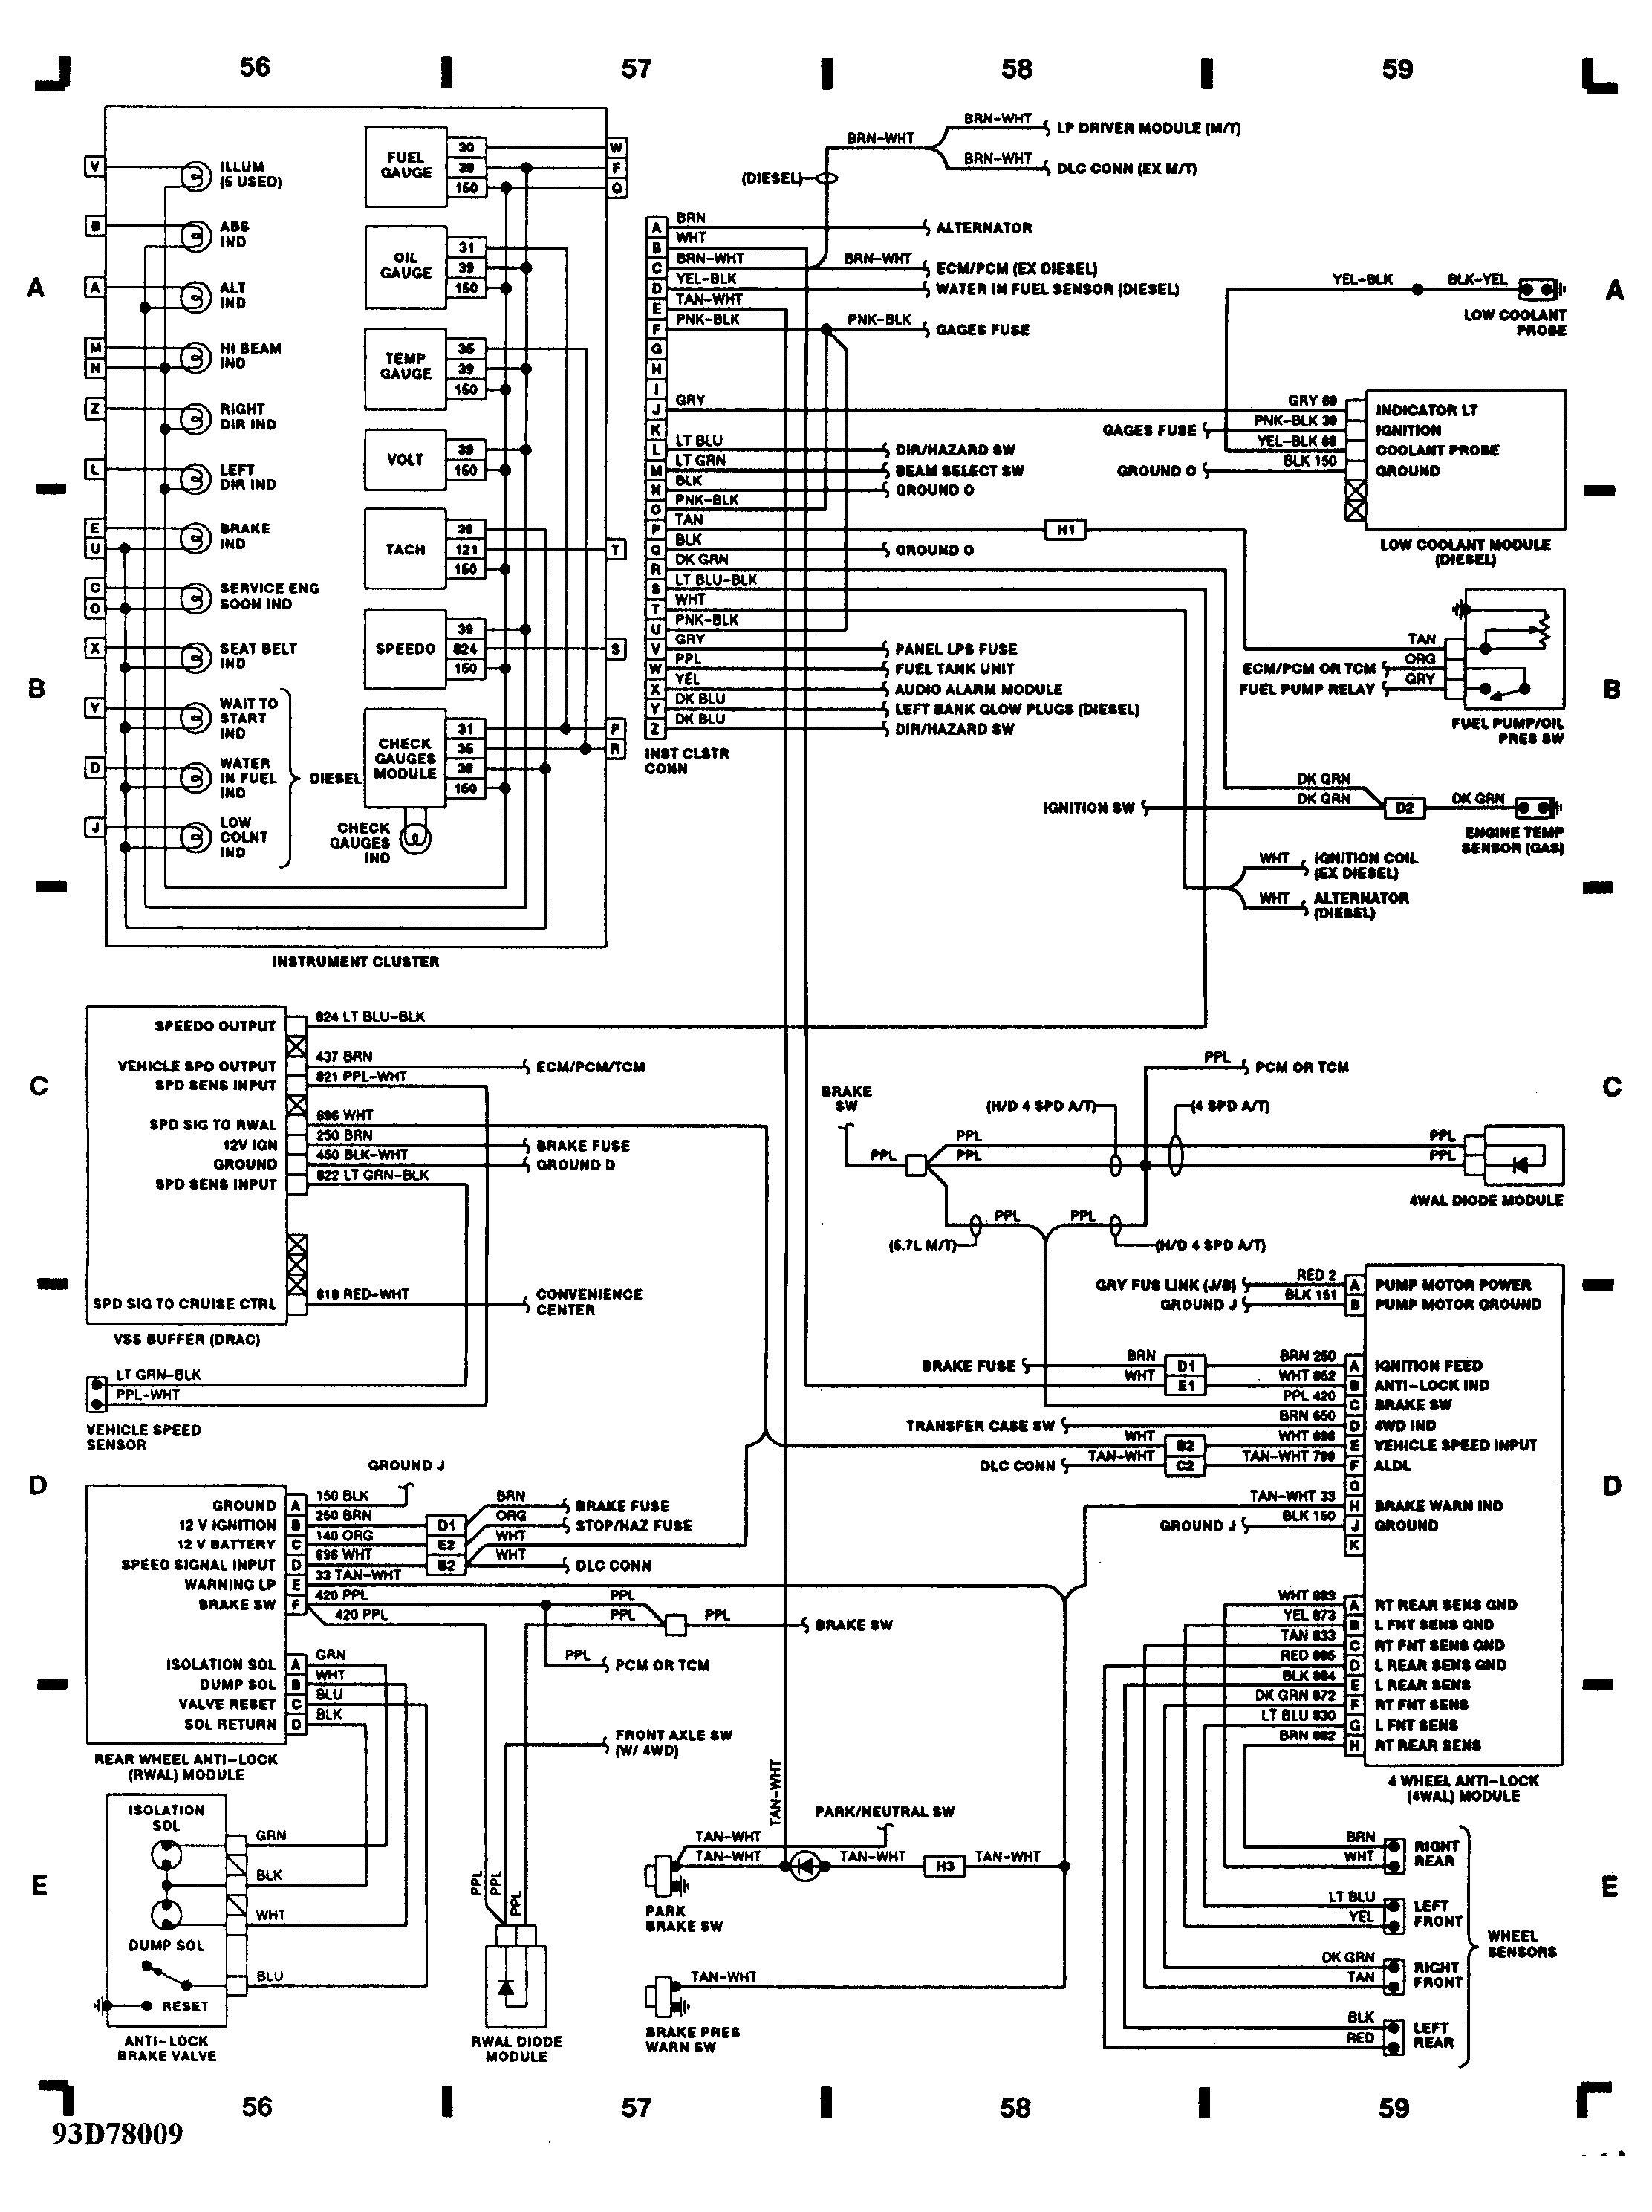 Chevrolet 350 Engine Diagram Gm Ls1 Engine Wiring Diagram Reveolution Wiring Diagram • Of Chevrolet 350 Engine Diagram